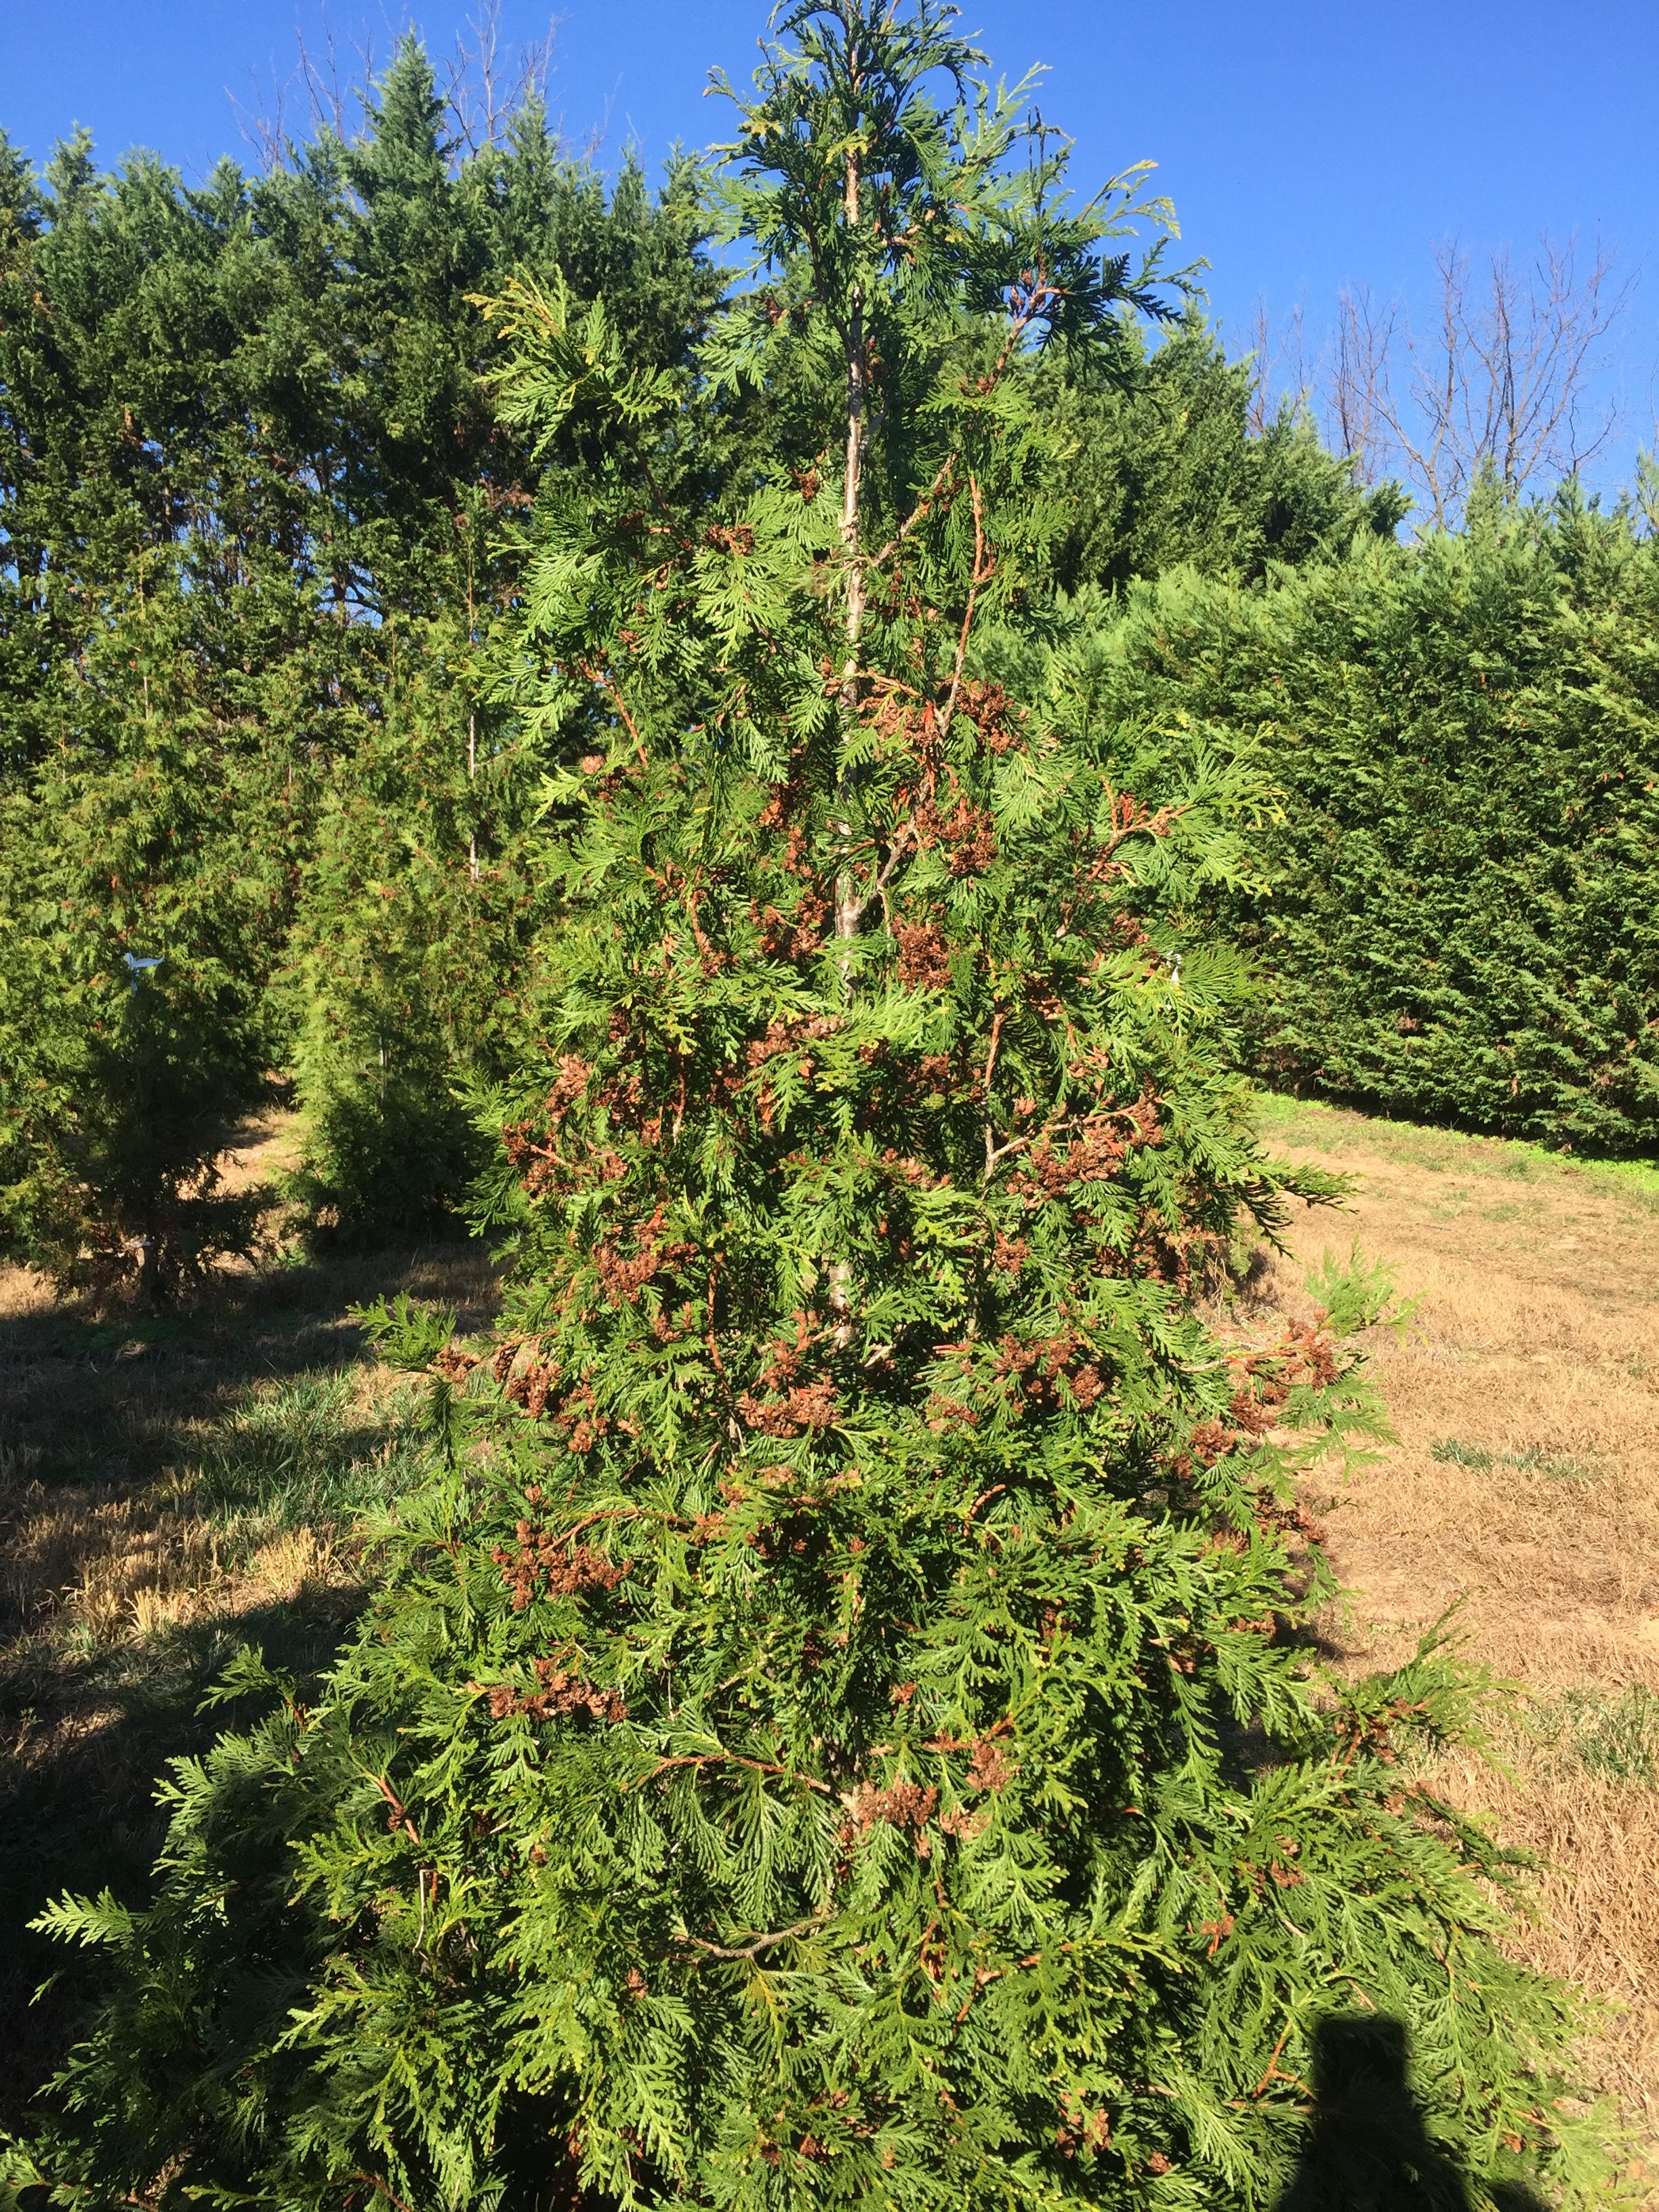 Green Giant Arborvitae cone clusters